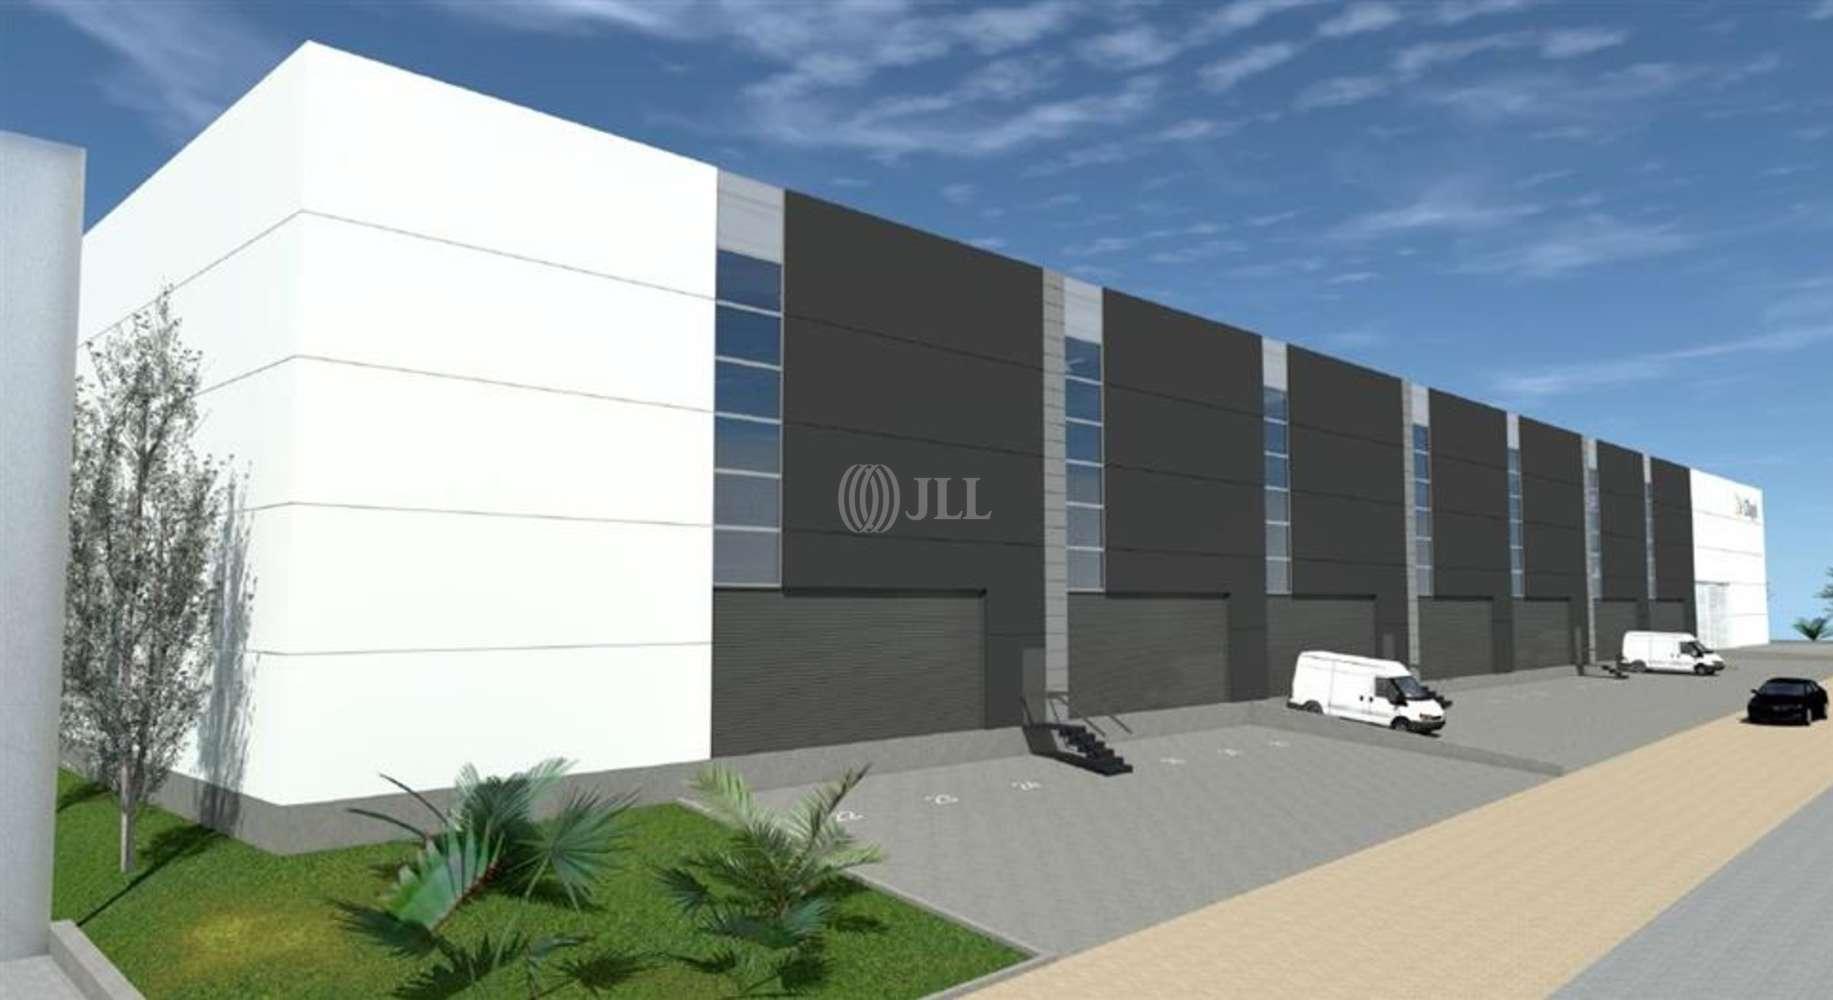 Naves industriales y logísticas Ripollet, 08291 - Nave Logistica - B0453 - PI RIPOLLET PARK - 11755